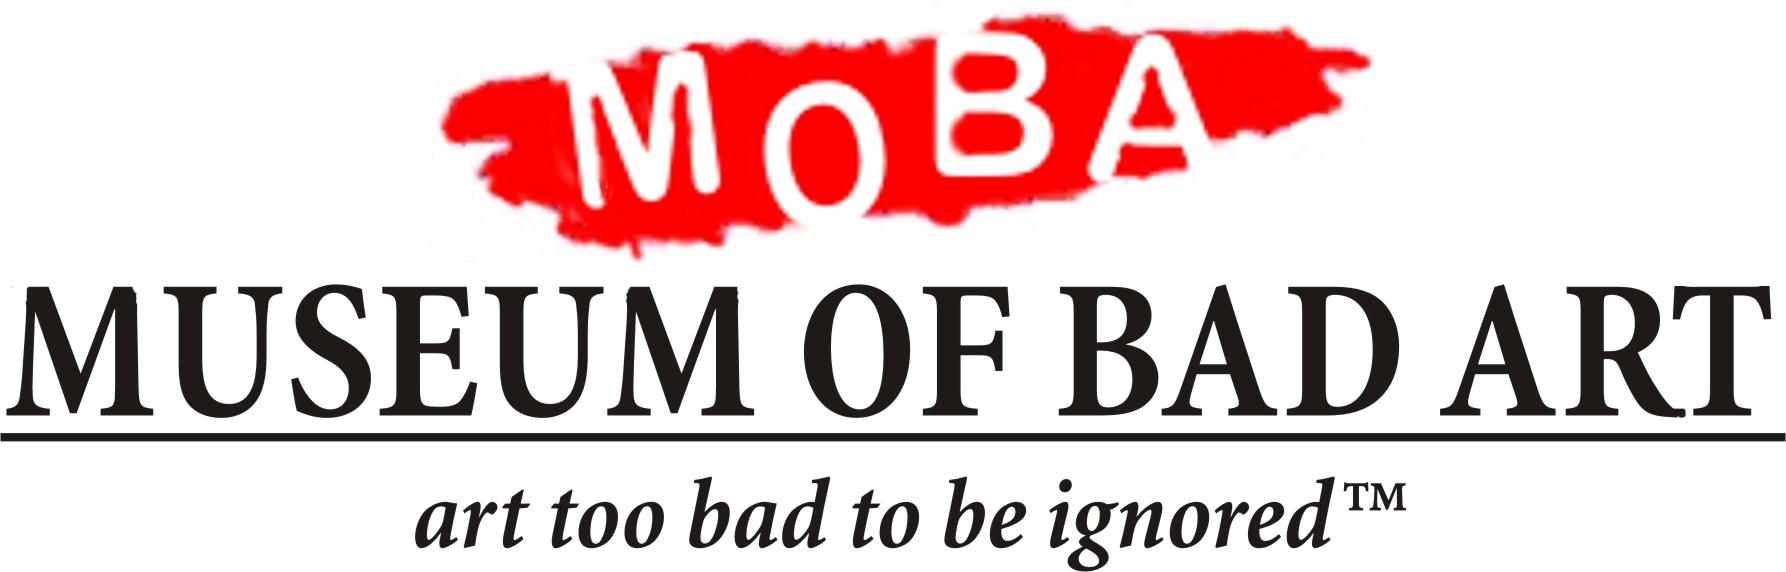 Museum Of Bad Art: MOBA 101